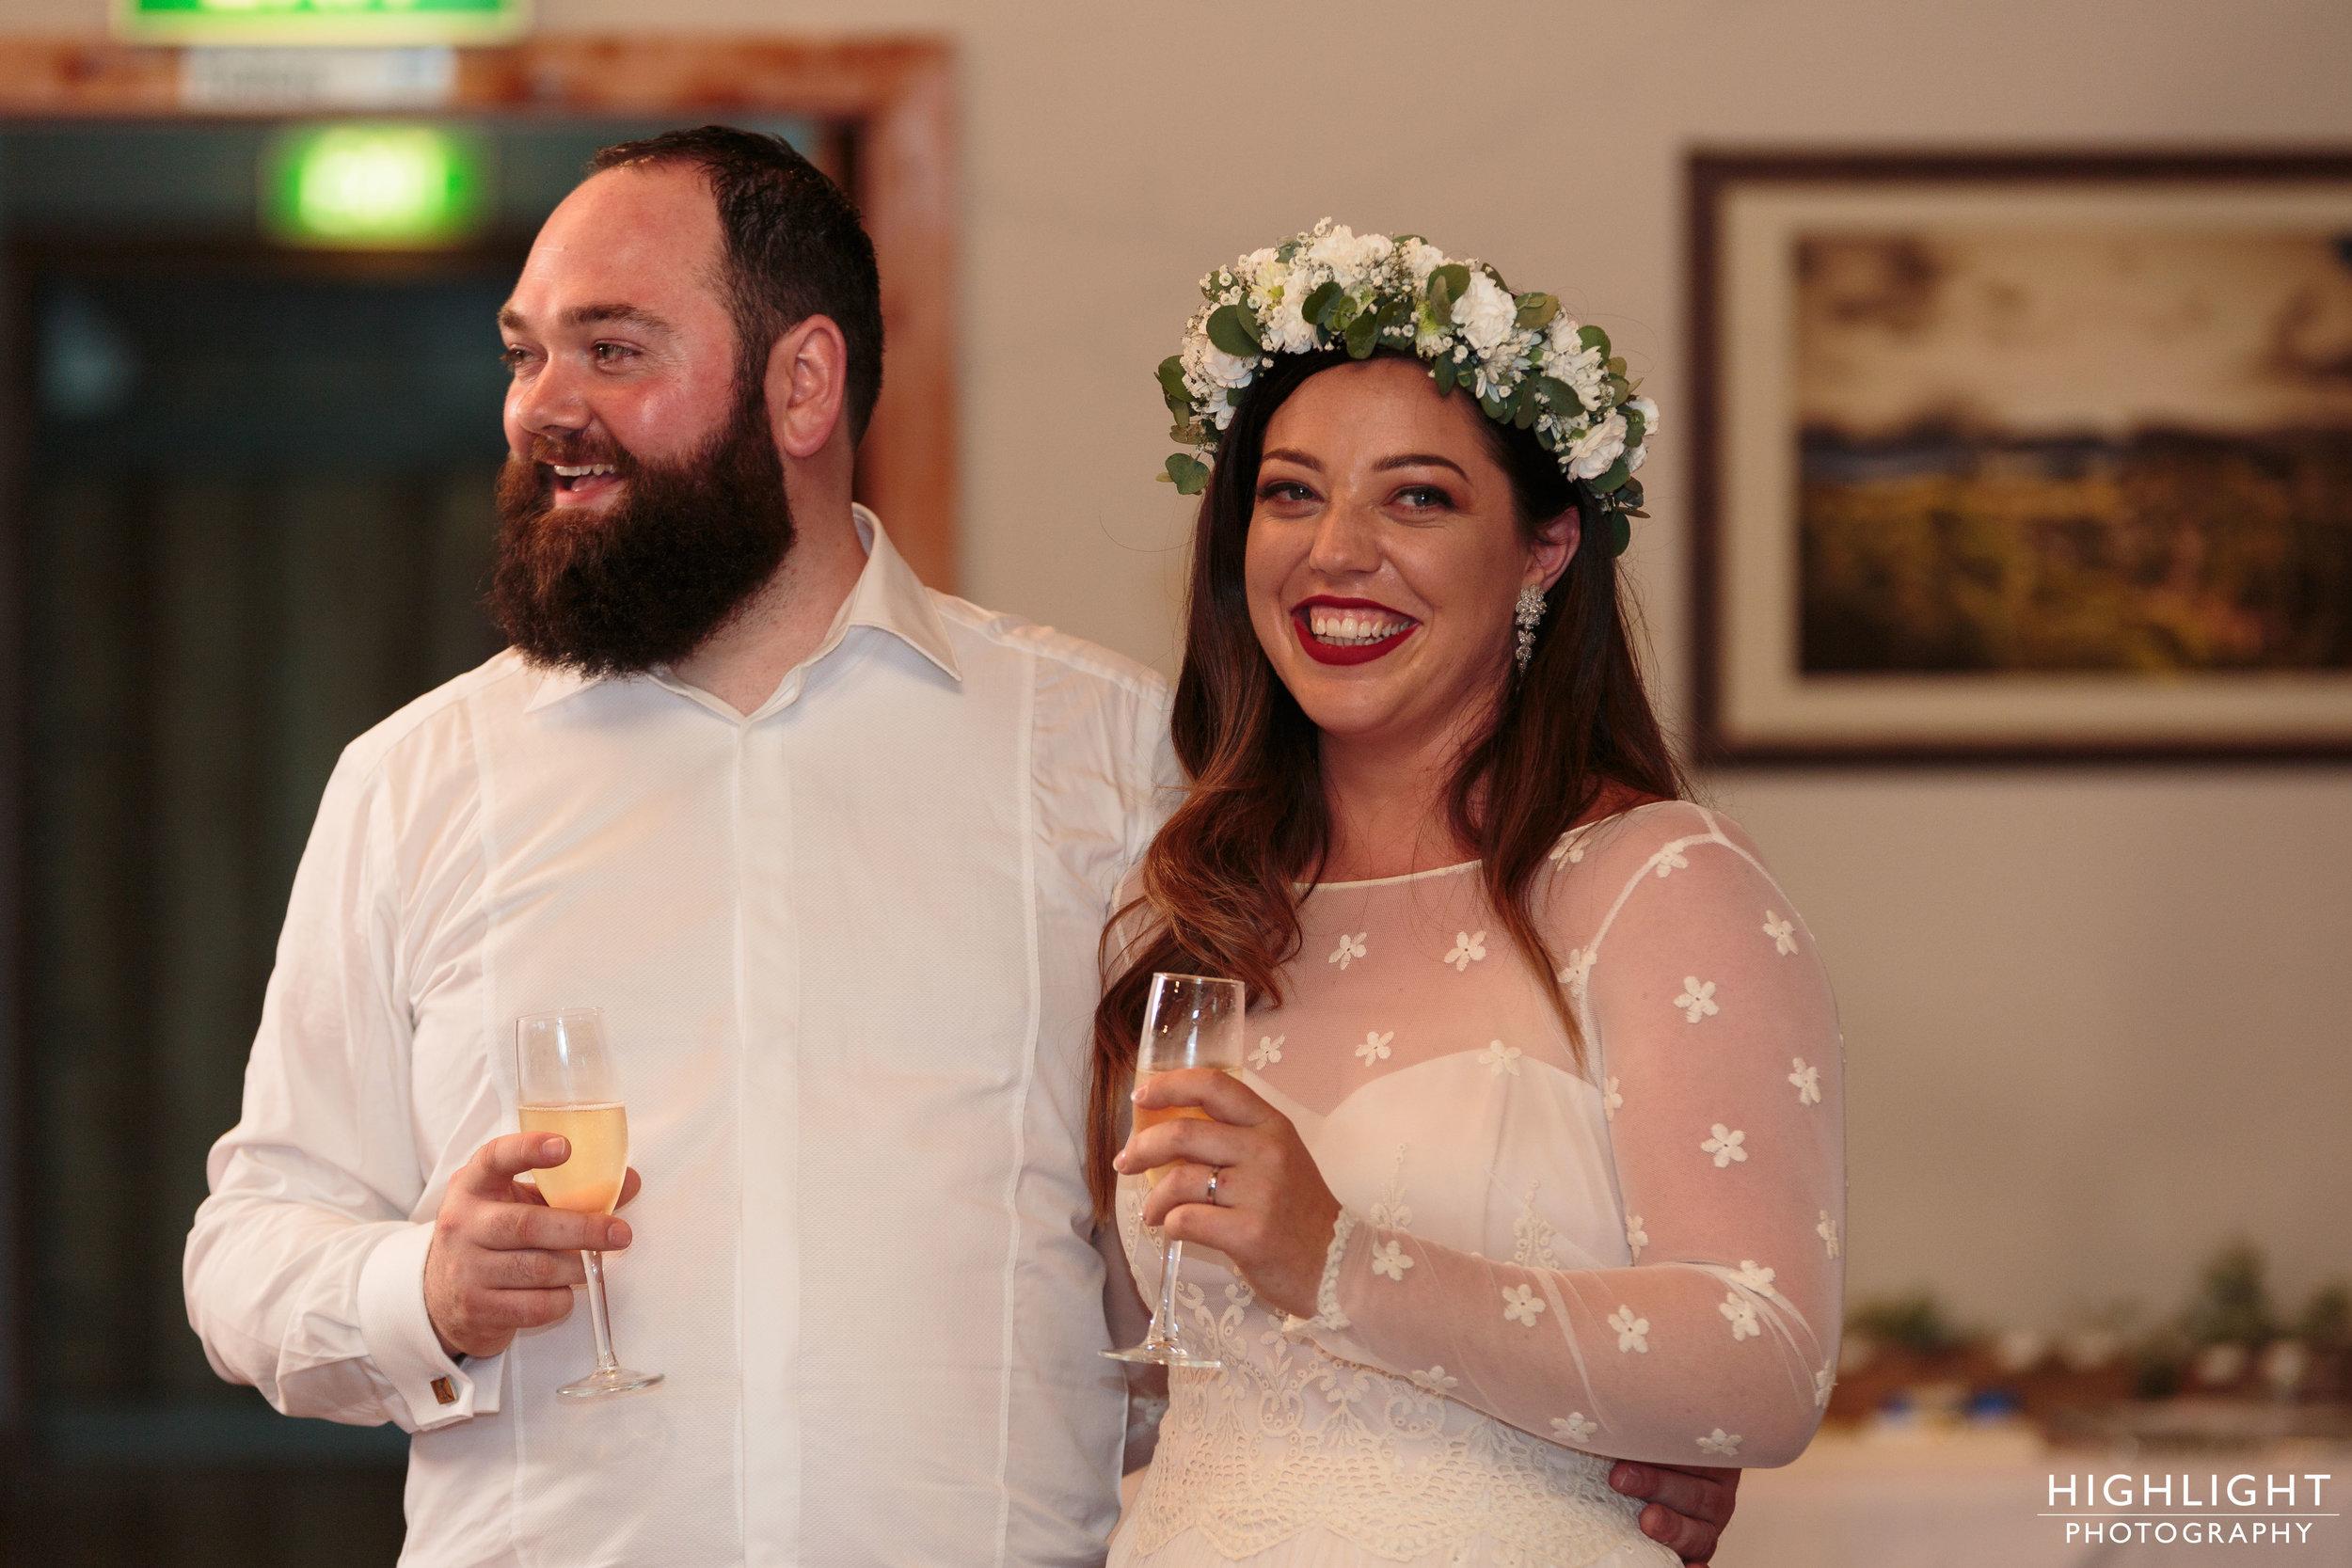 highlight-wedding-photography-new-zealand-makoura-lodge-wedding-162.jpg